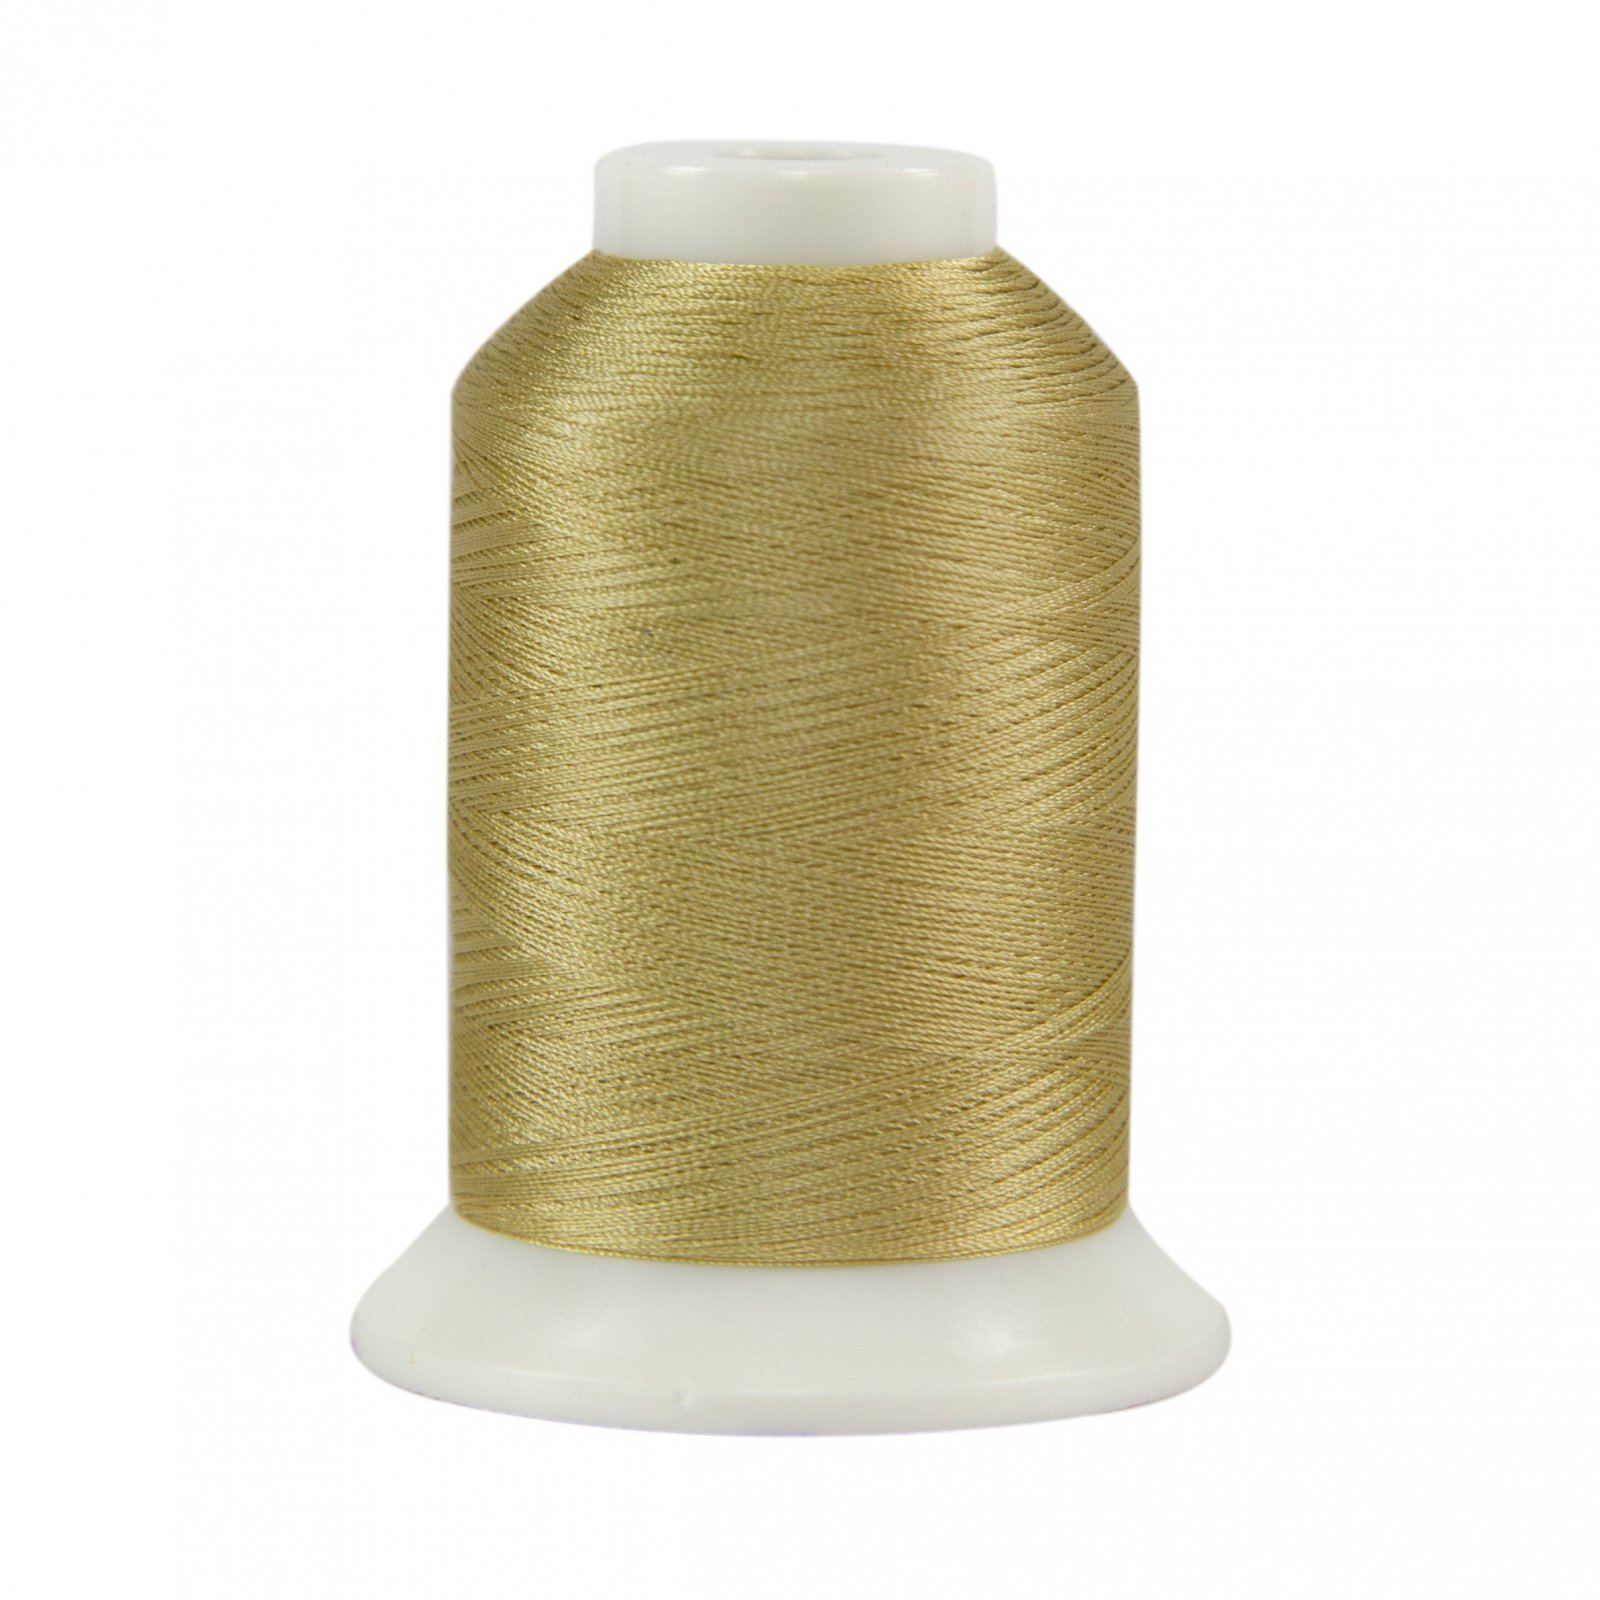 Kimono Silk Thread 100wt 1090yd Maui Sand